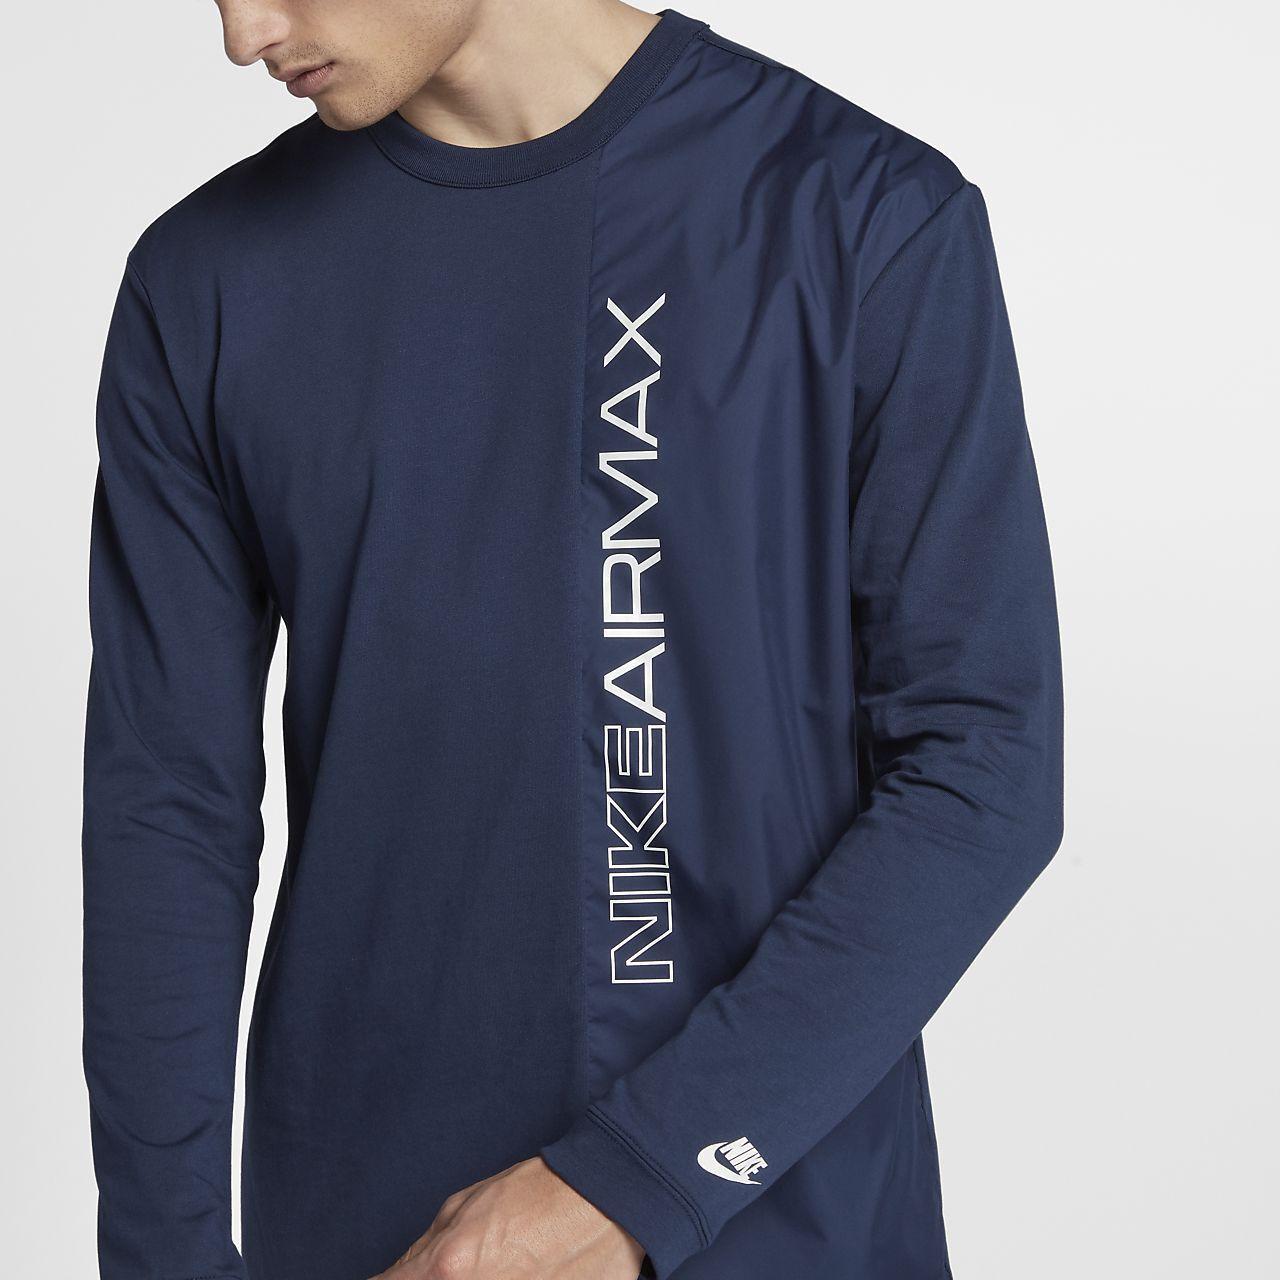 Nike Sportruházat NIKE AIR MAX hosszú ujjú pulóver Air Max 1,90,95,97,98,180,270